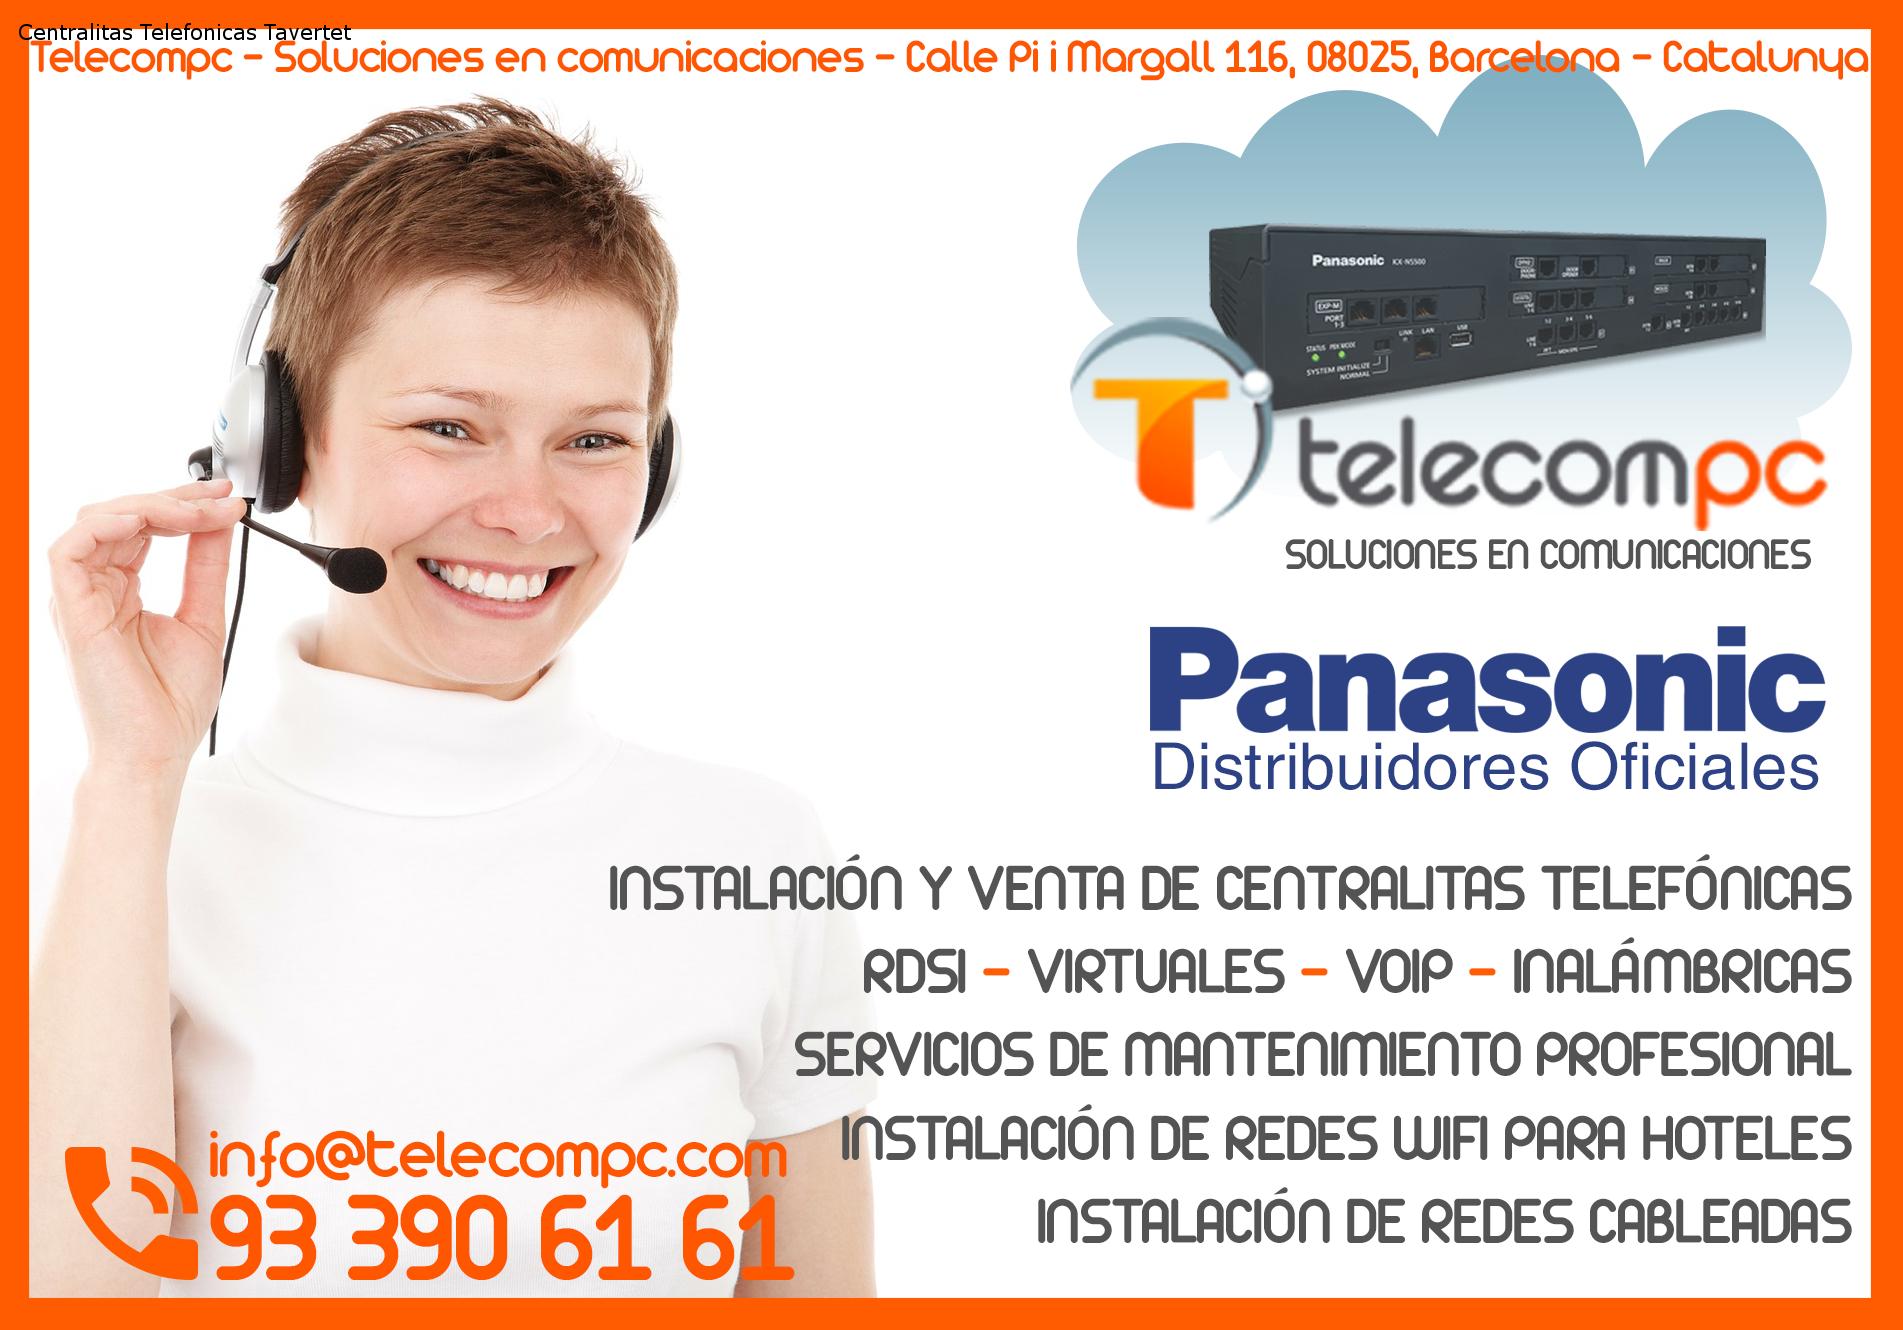 Centralitas Telefonicas Tavertet